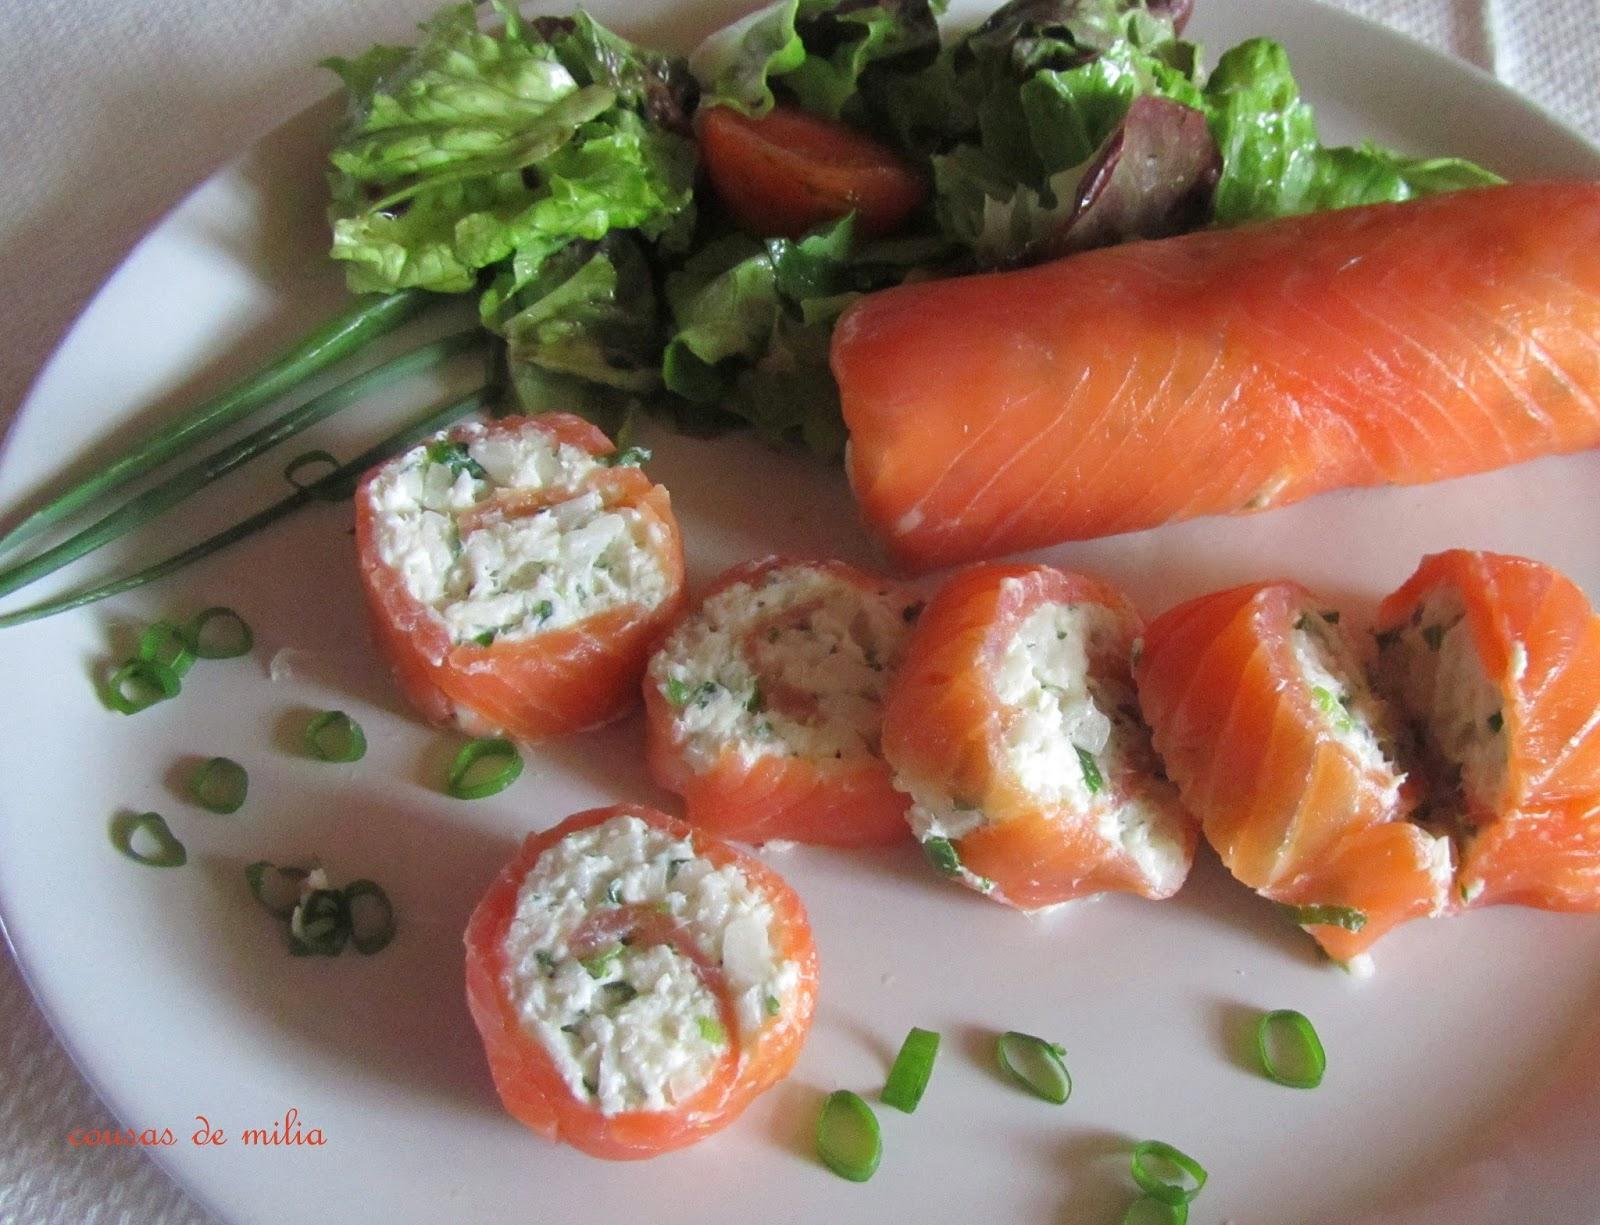 Rollitos de salmón con salsa de yogurt